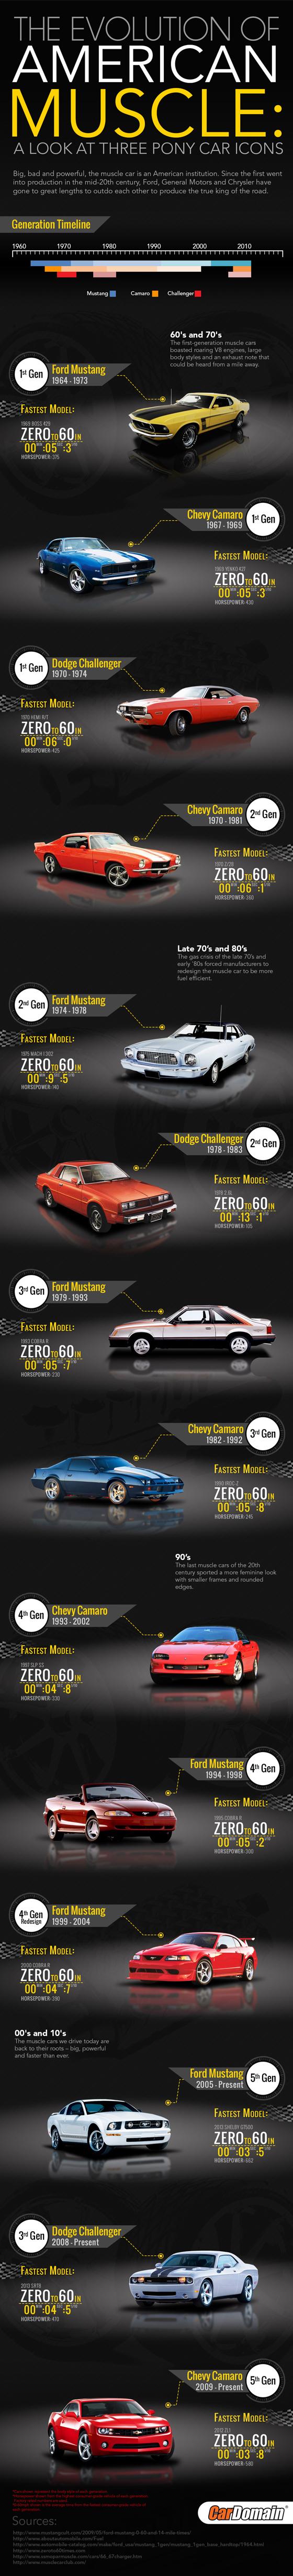 Classic American Pony Cars - Zero To 60 Times